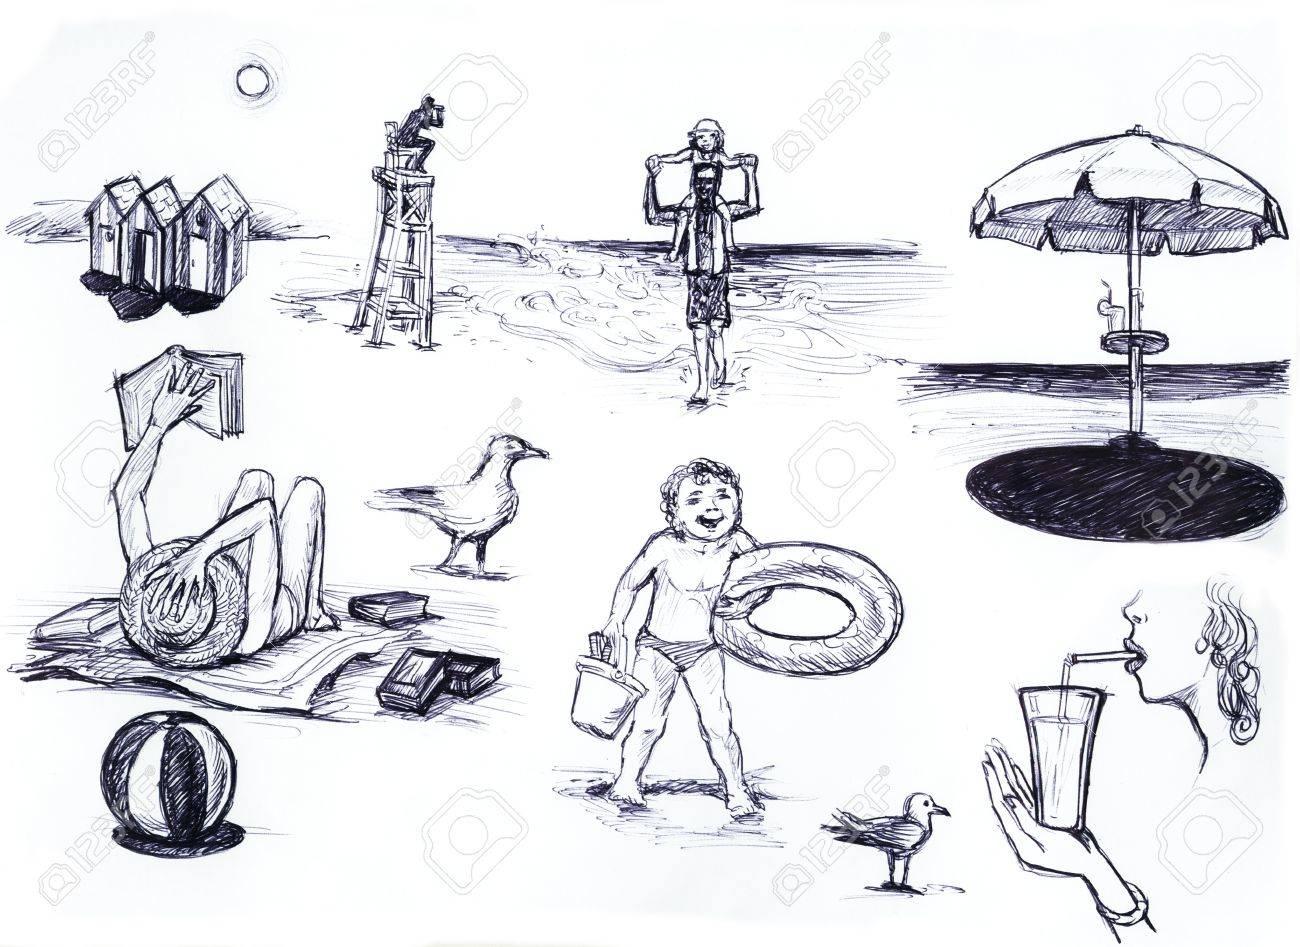 Summer scene at the beach pencil sketch illustration stock illustration 14099442